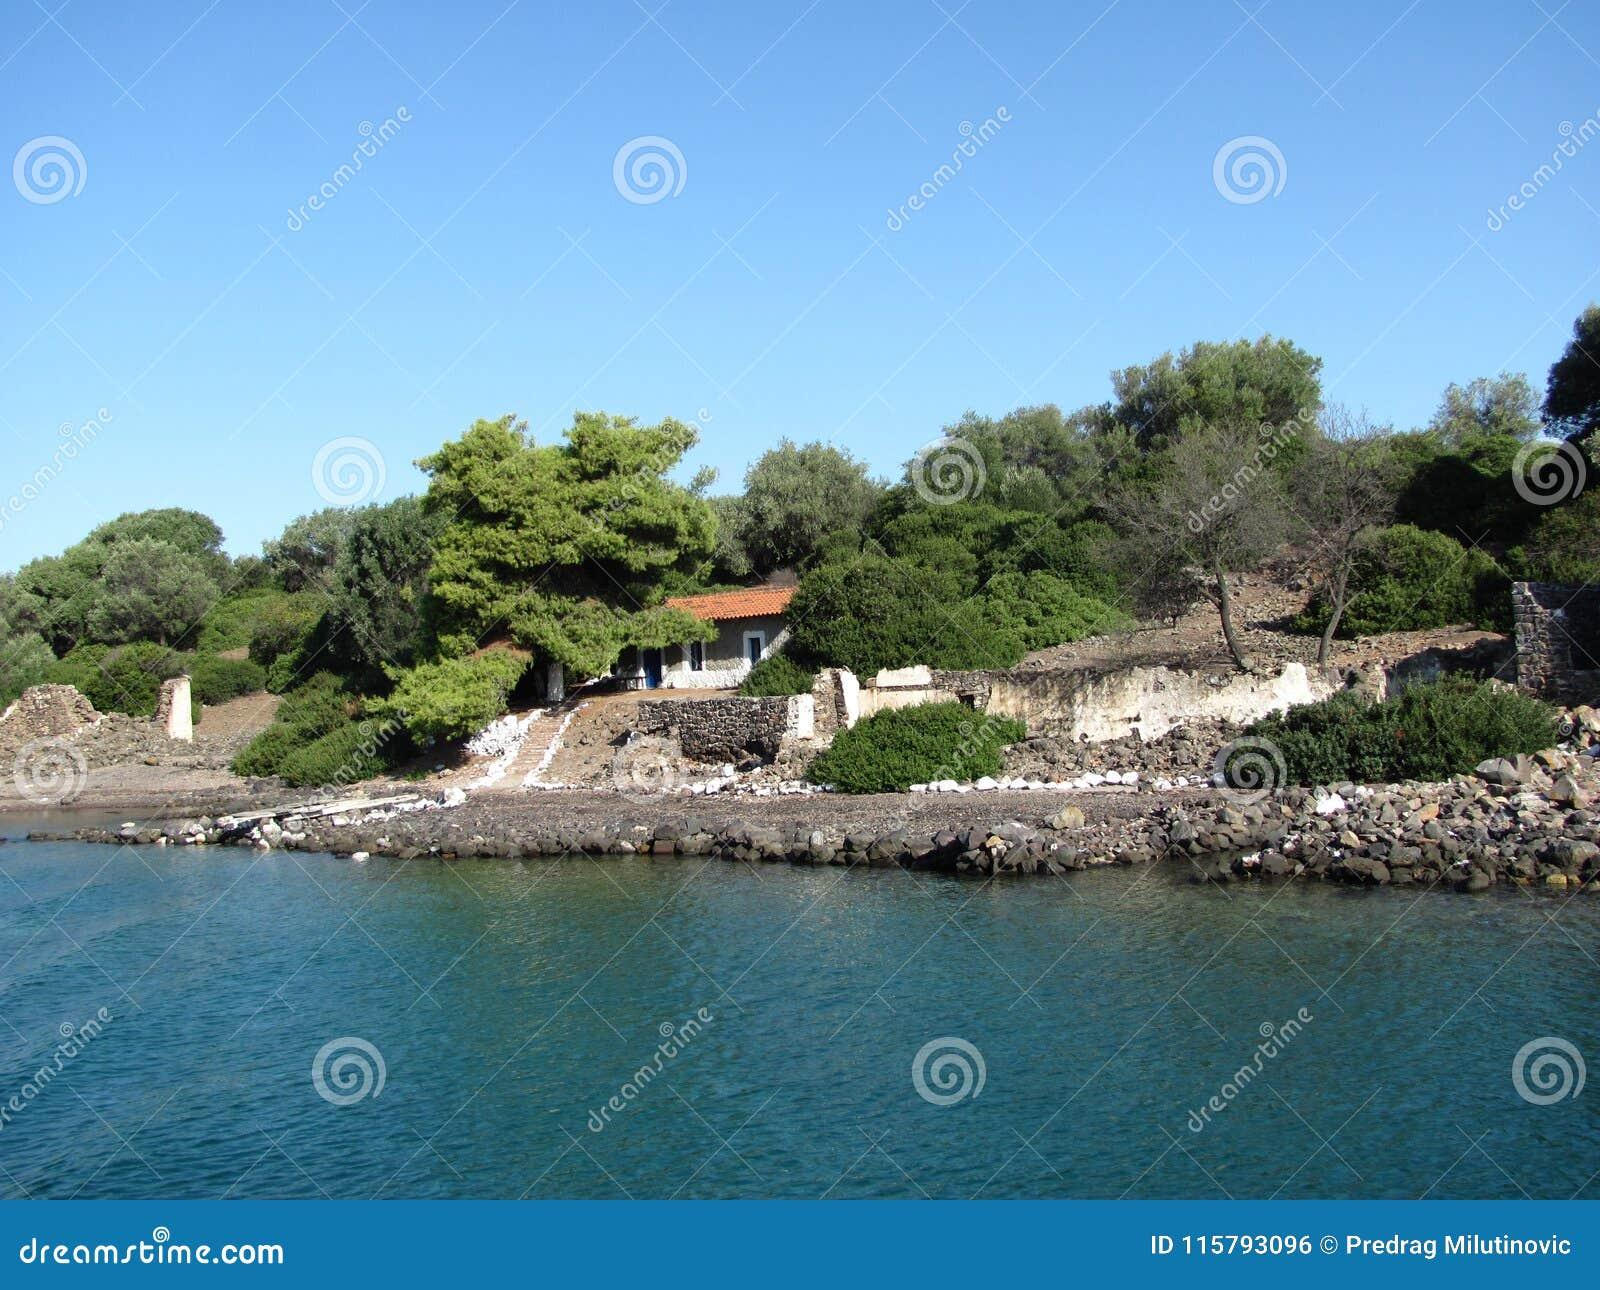 Island in the Aegean Sea